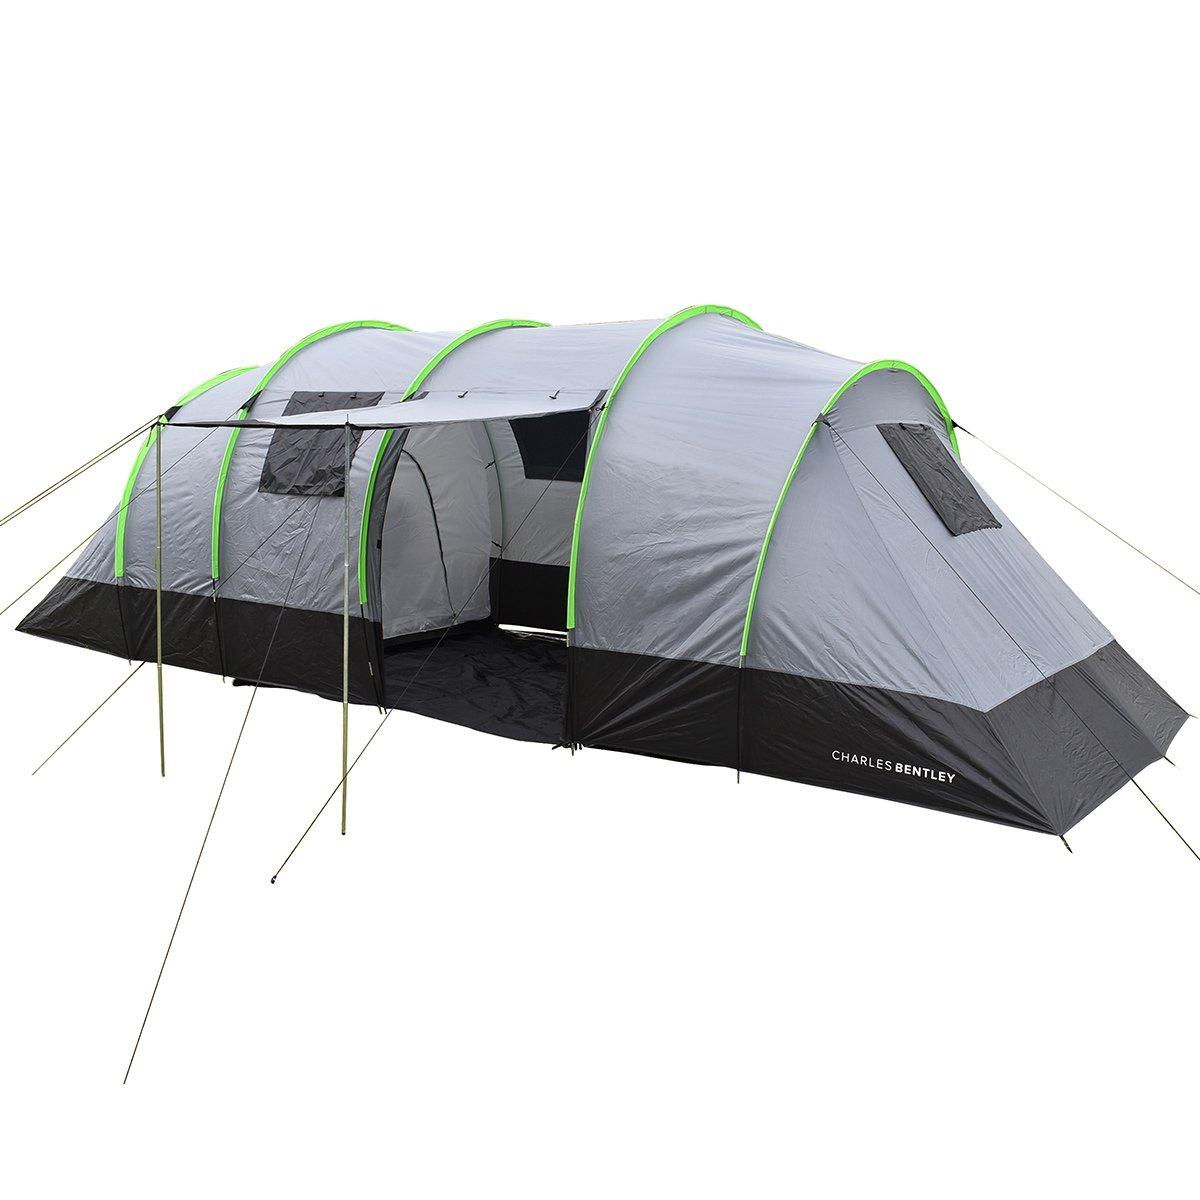 Charles Bentley 8 Personen Familie Camping Tunnel Zelt 2 Zimmer Markise L690 x W240 x H220cm - Grau